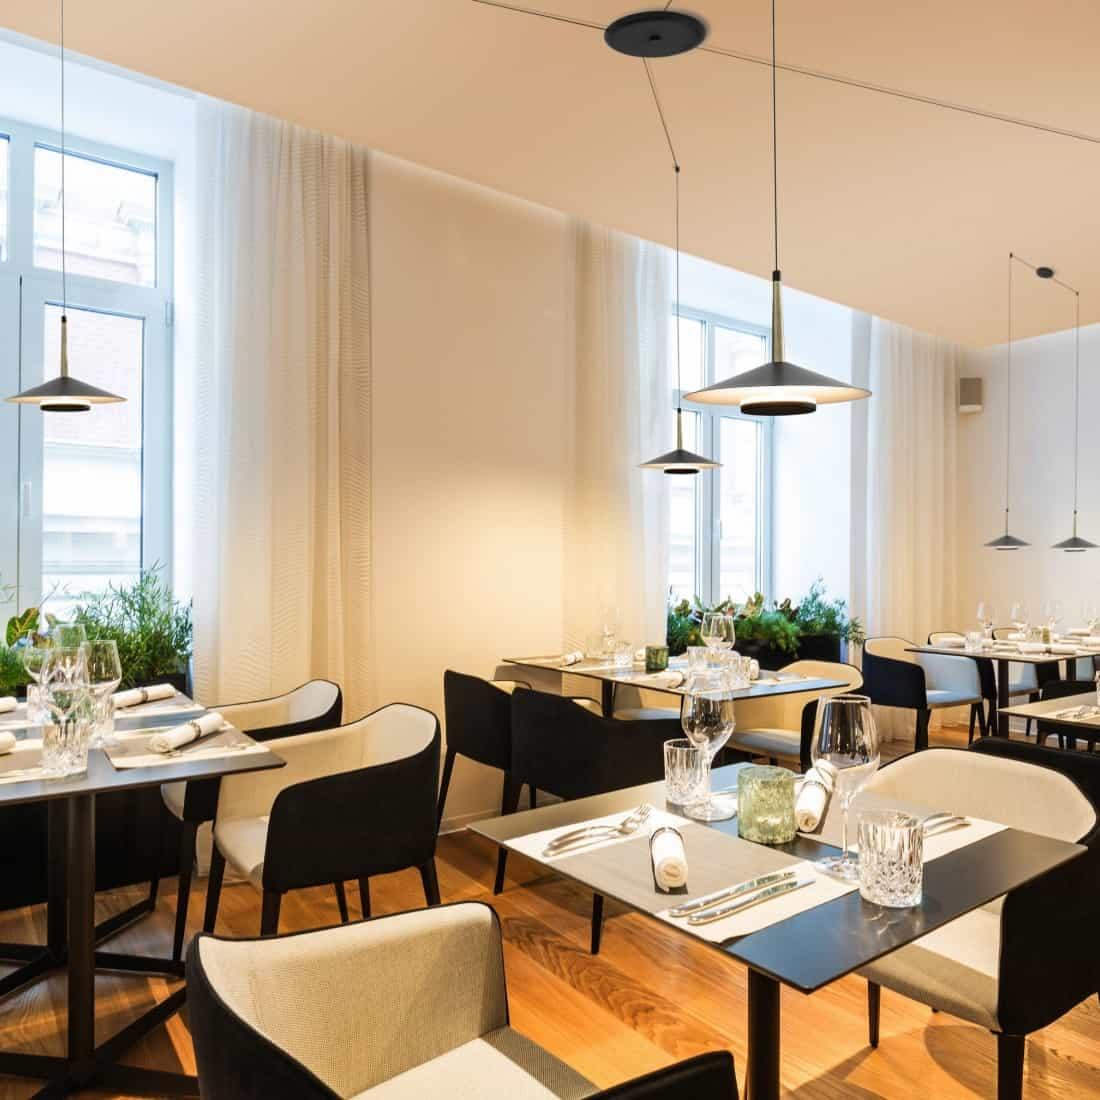 Pendule hotel/restaurant